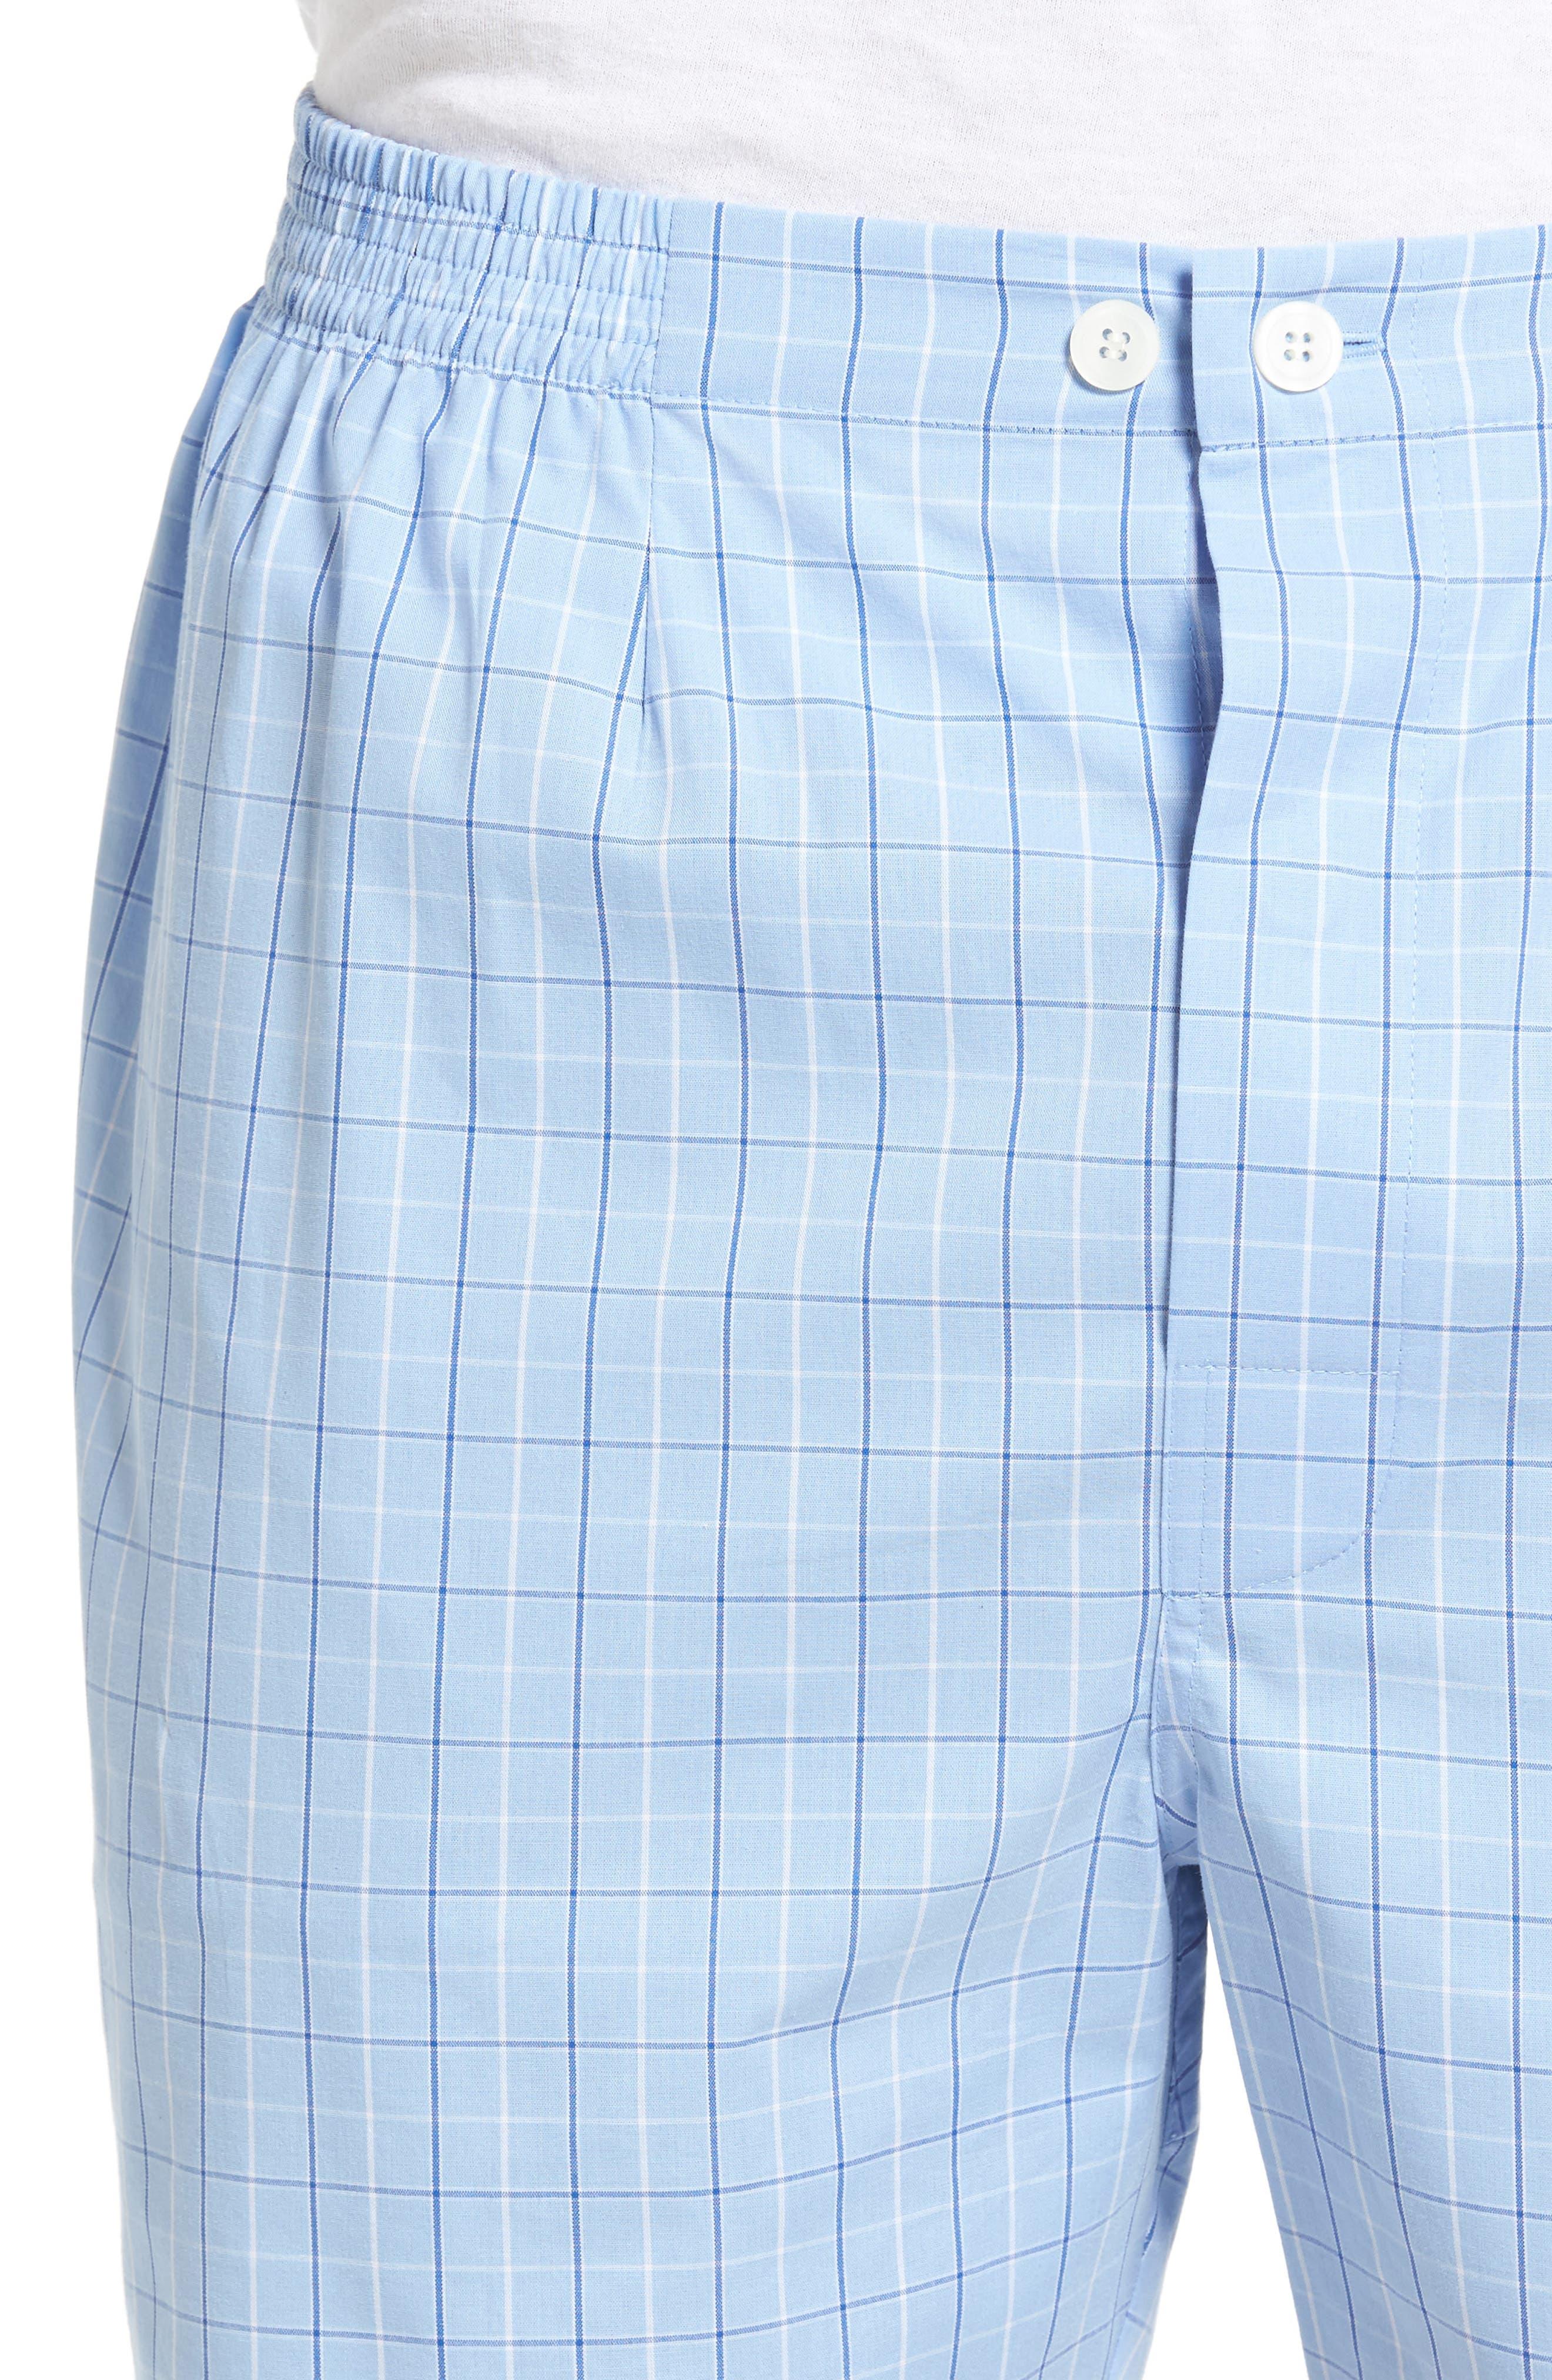 Cotton Short Pajamas,                             Alternate thumbnail 4, color,                             Light Blue Check